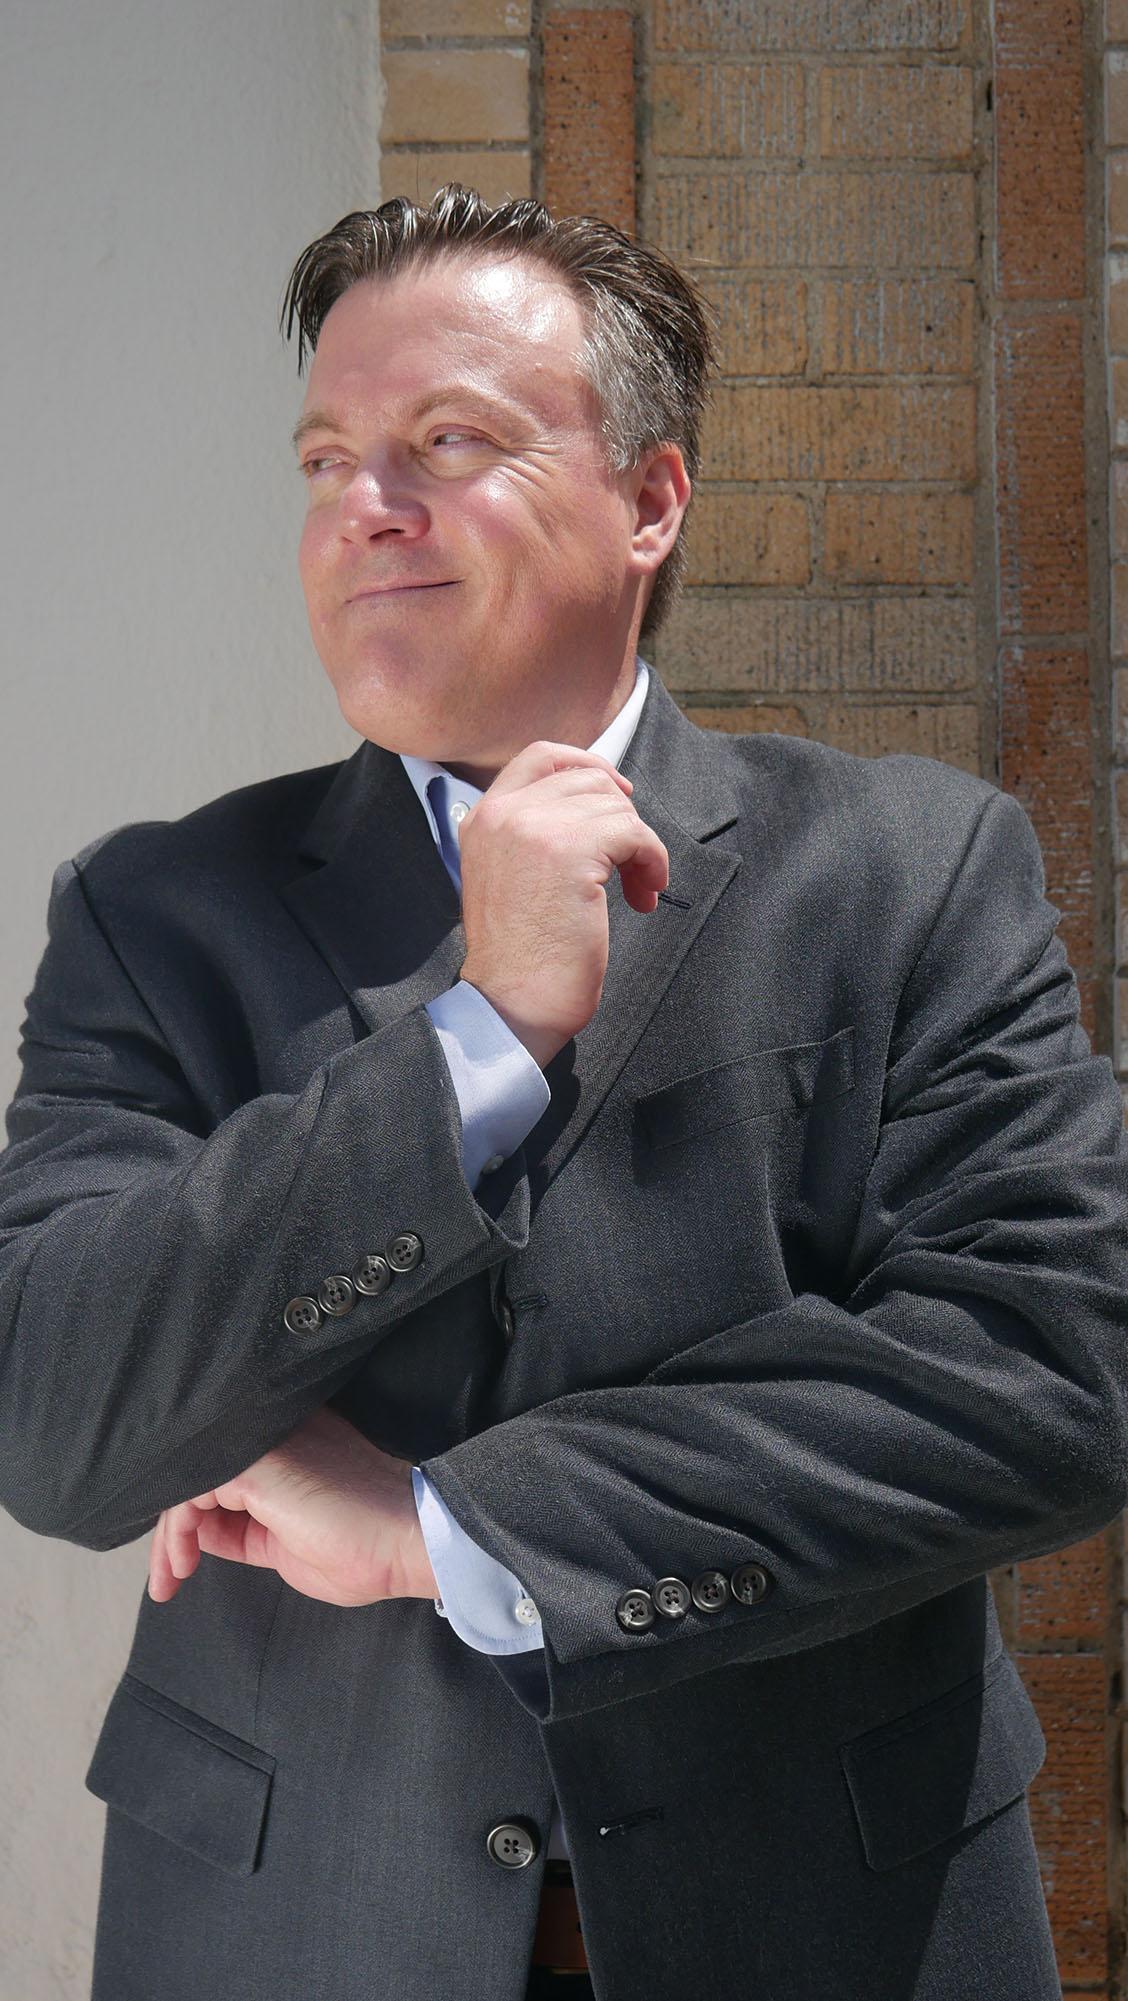 Mike Branom